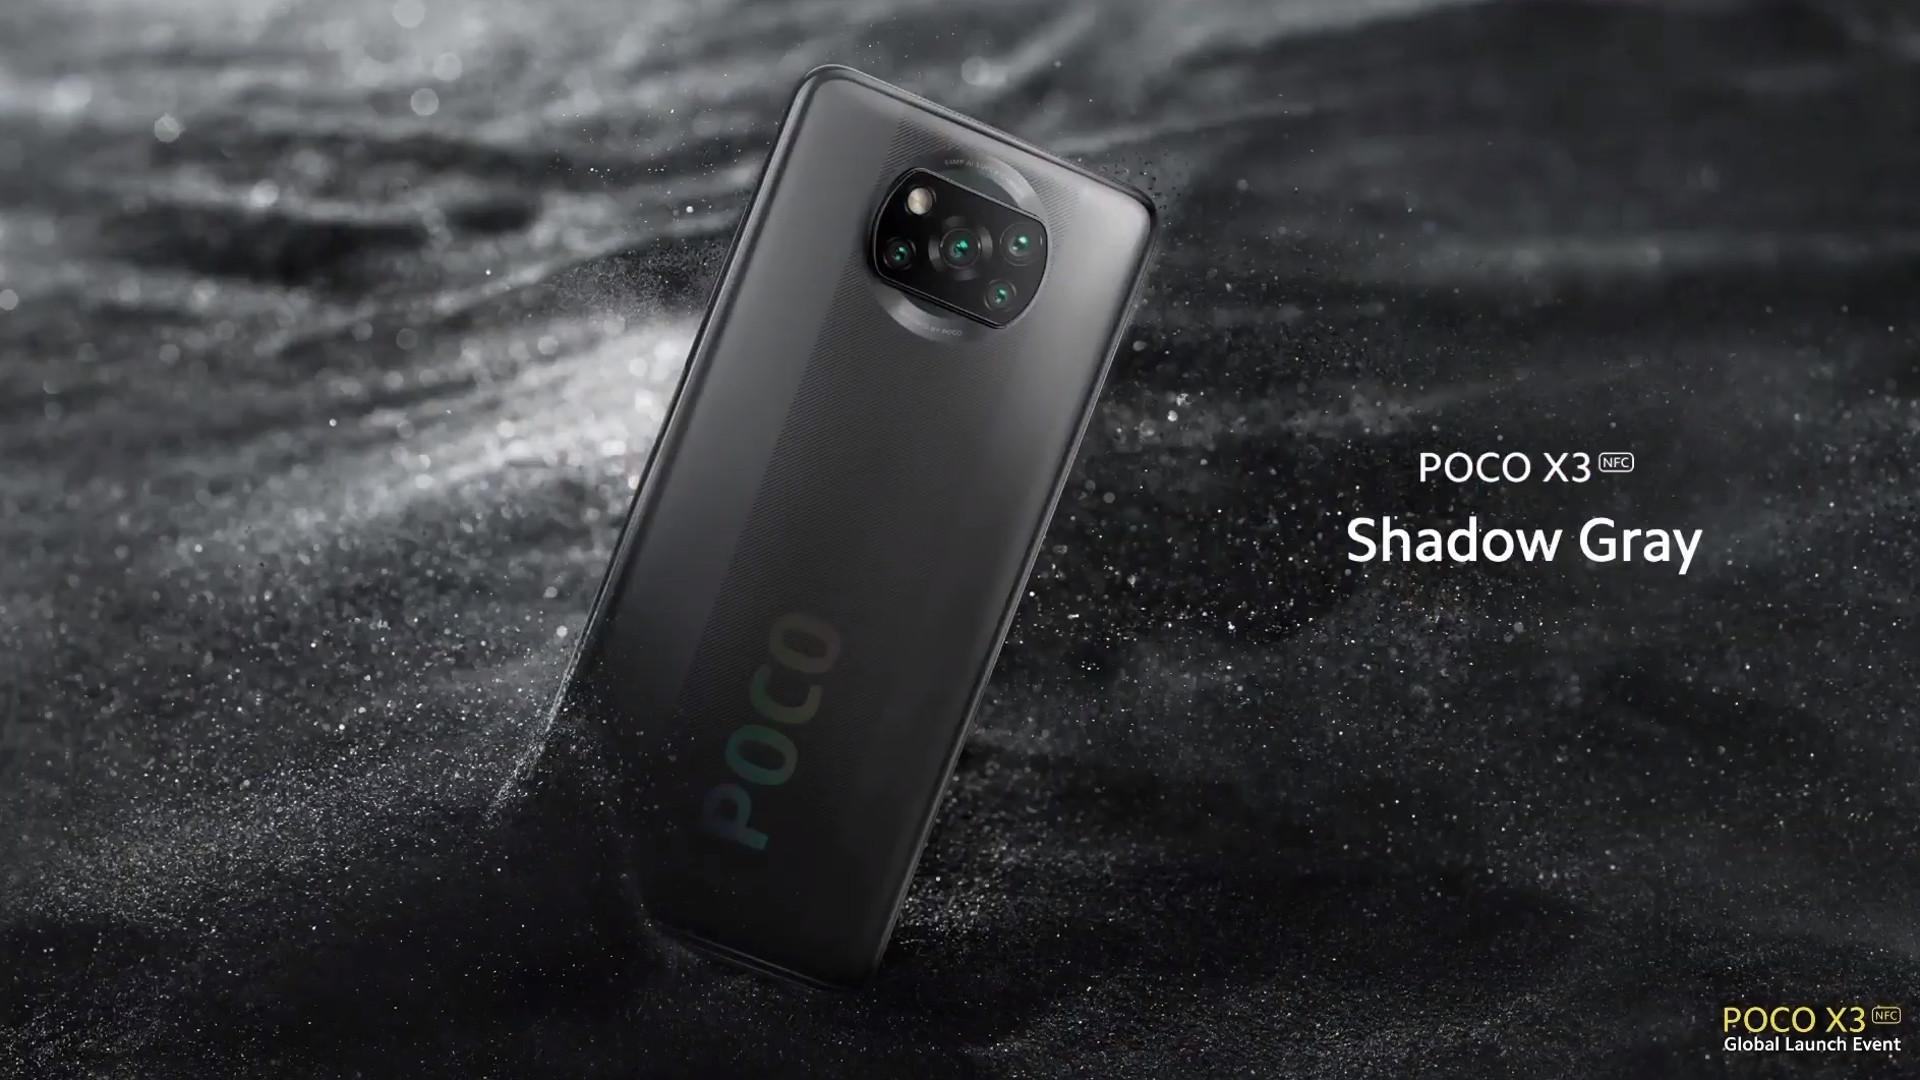 Poco X3 shadow grey